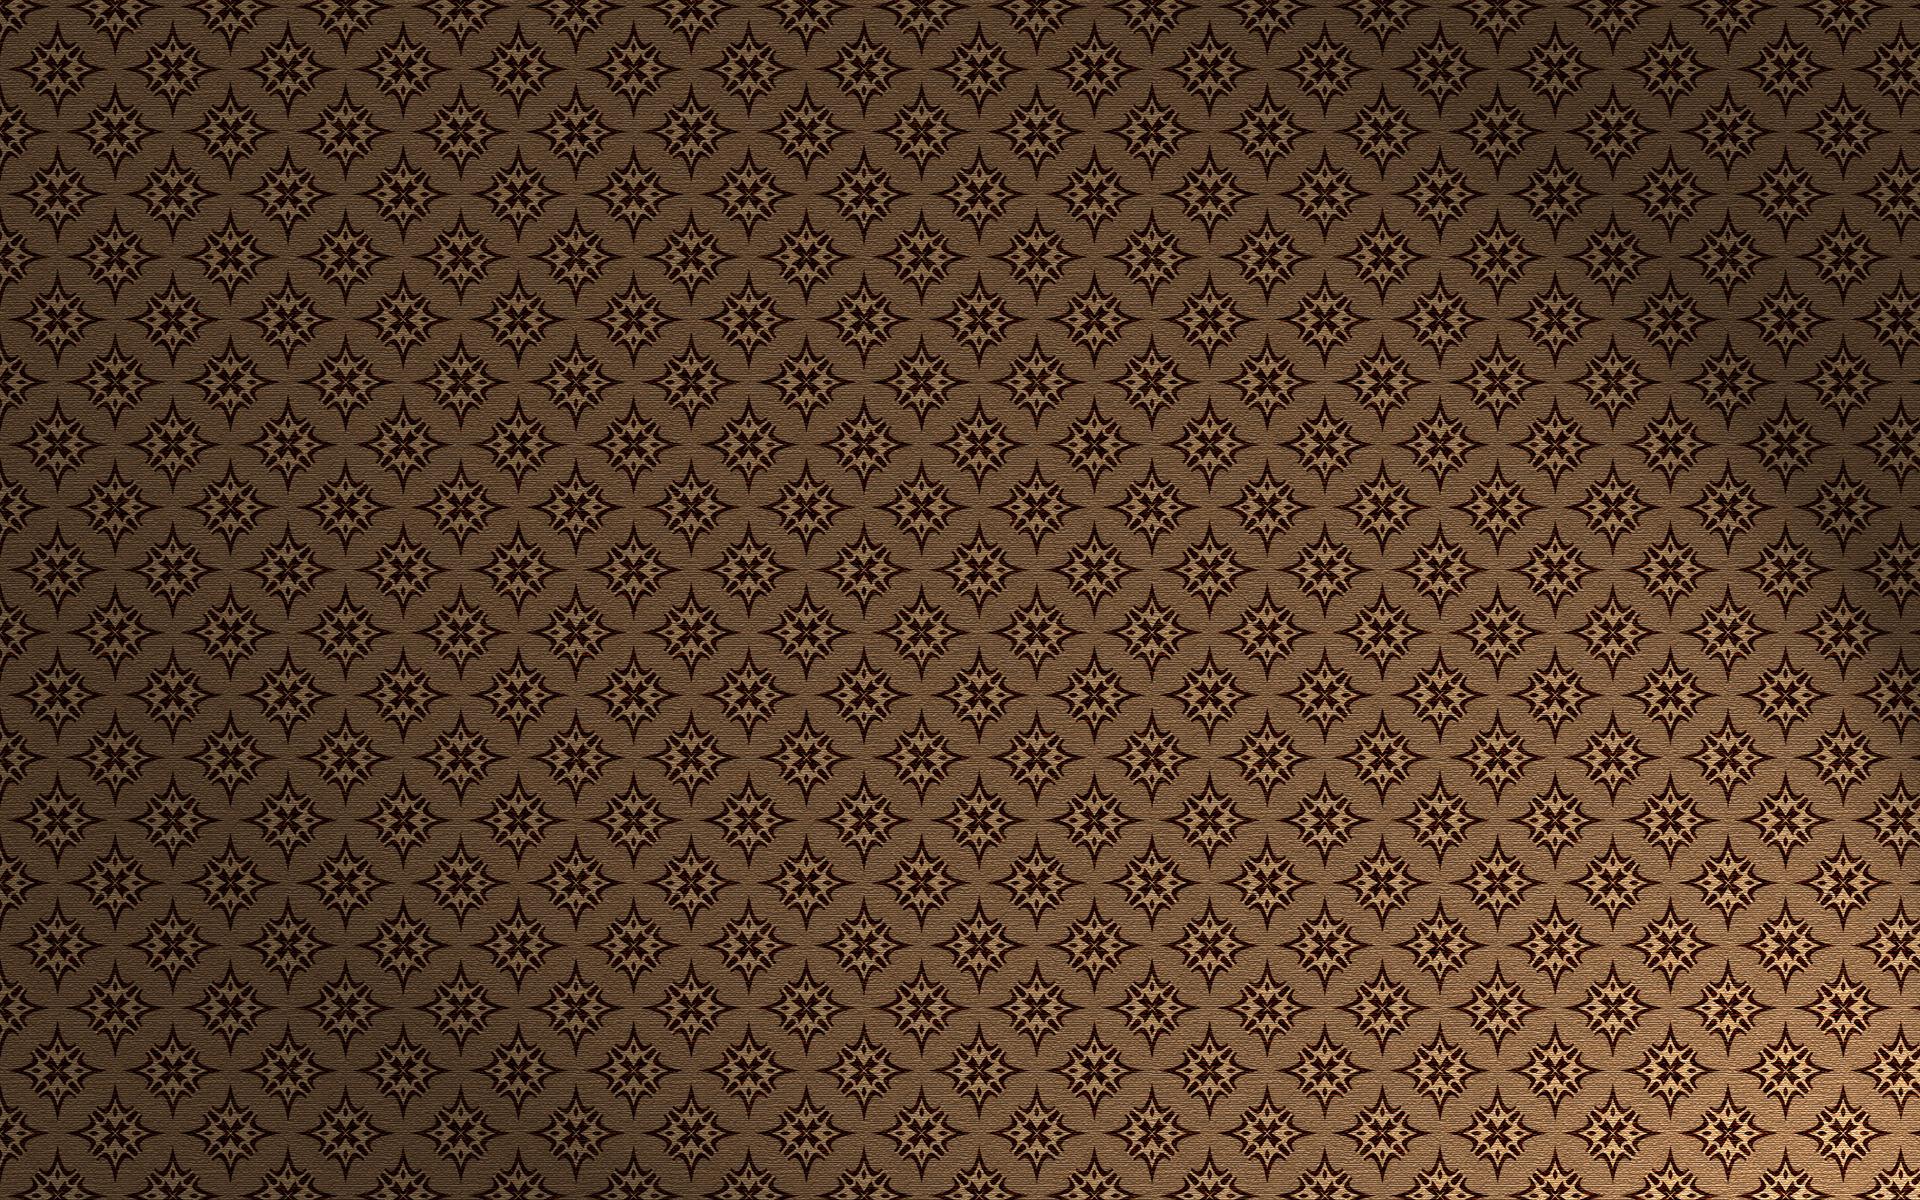 Vintage Brown Background 1920x1200